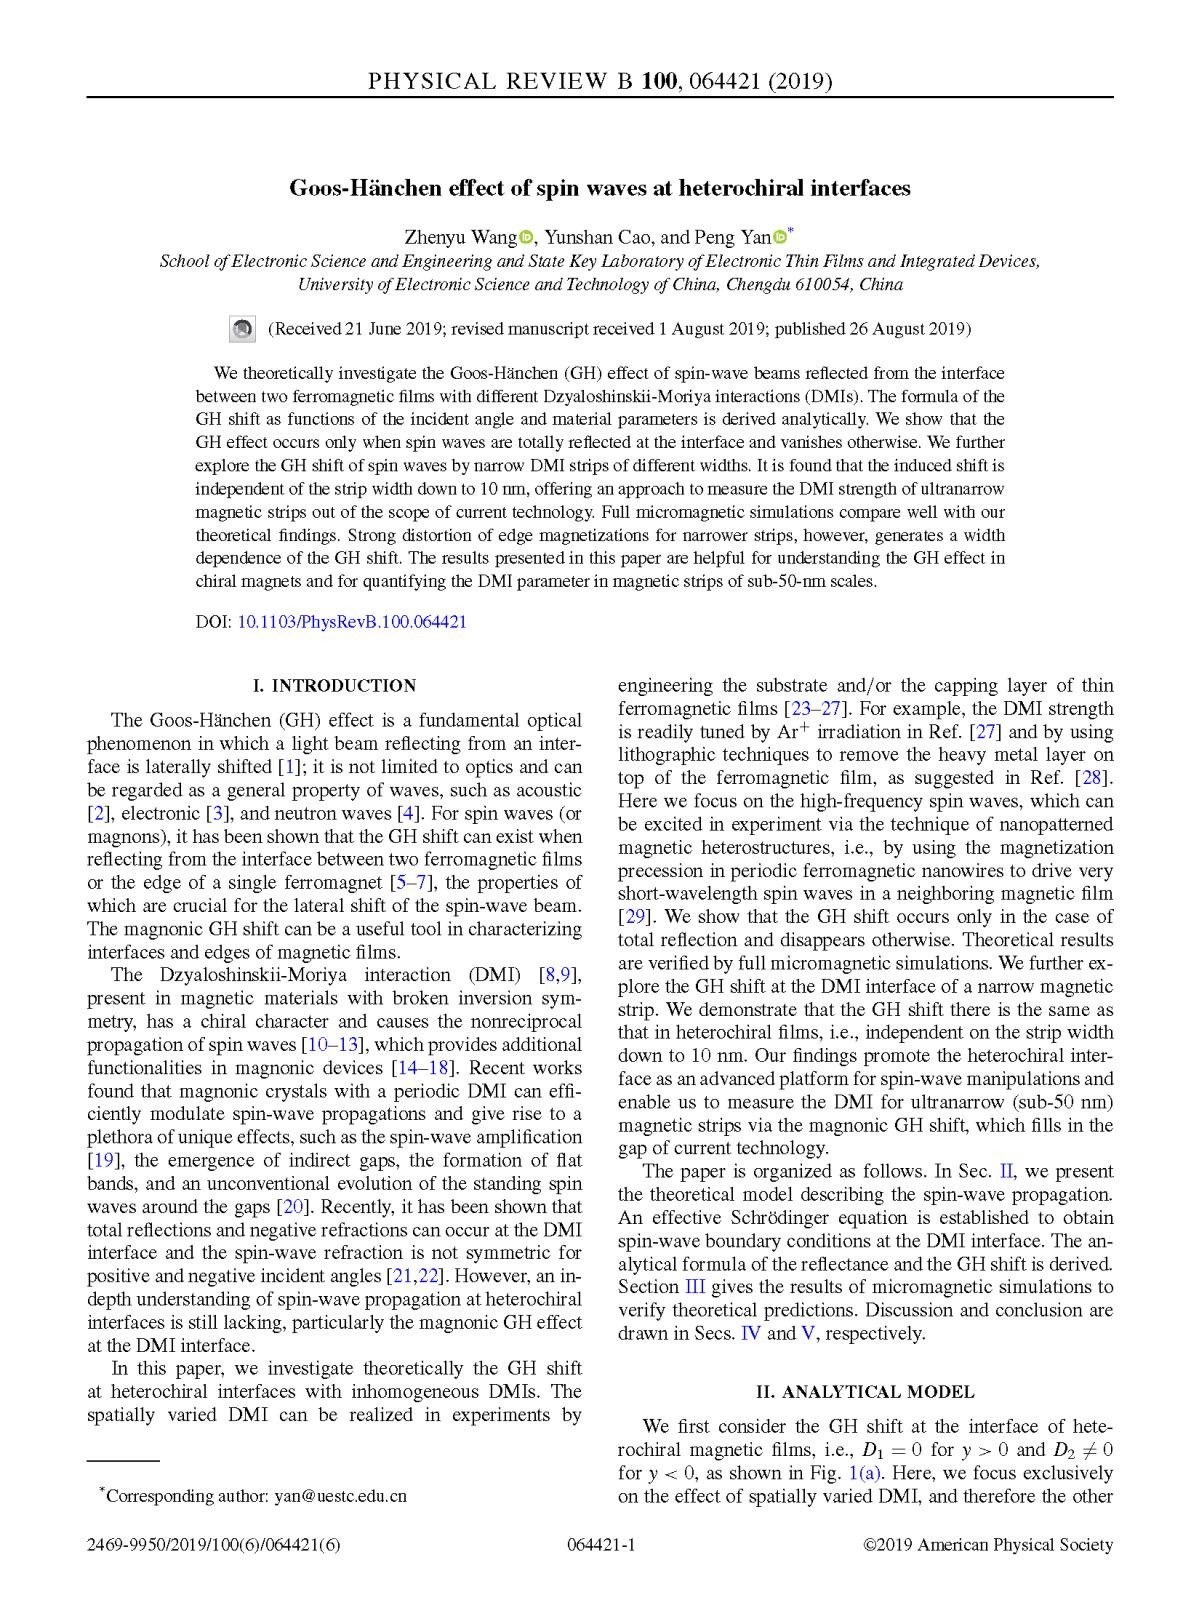 Phys. Rev. B 100, 064421 (2019)_页面_1.png